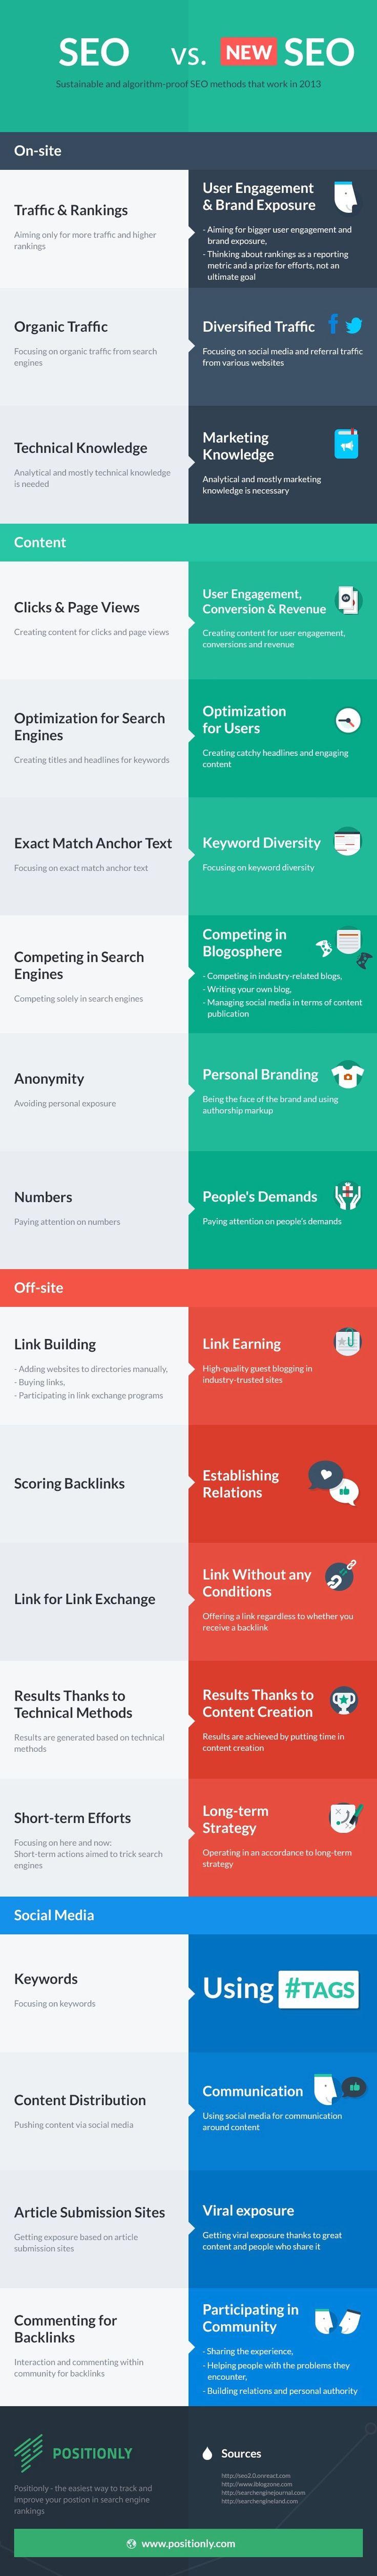 seo-marketing-2013-infographic